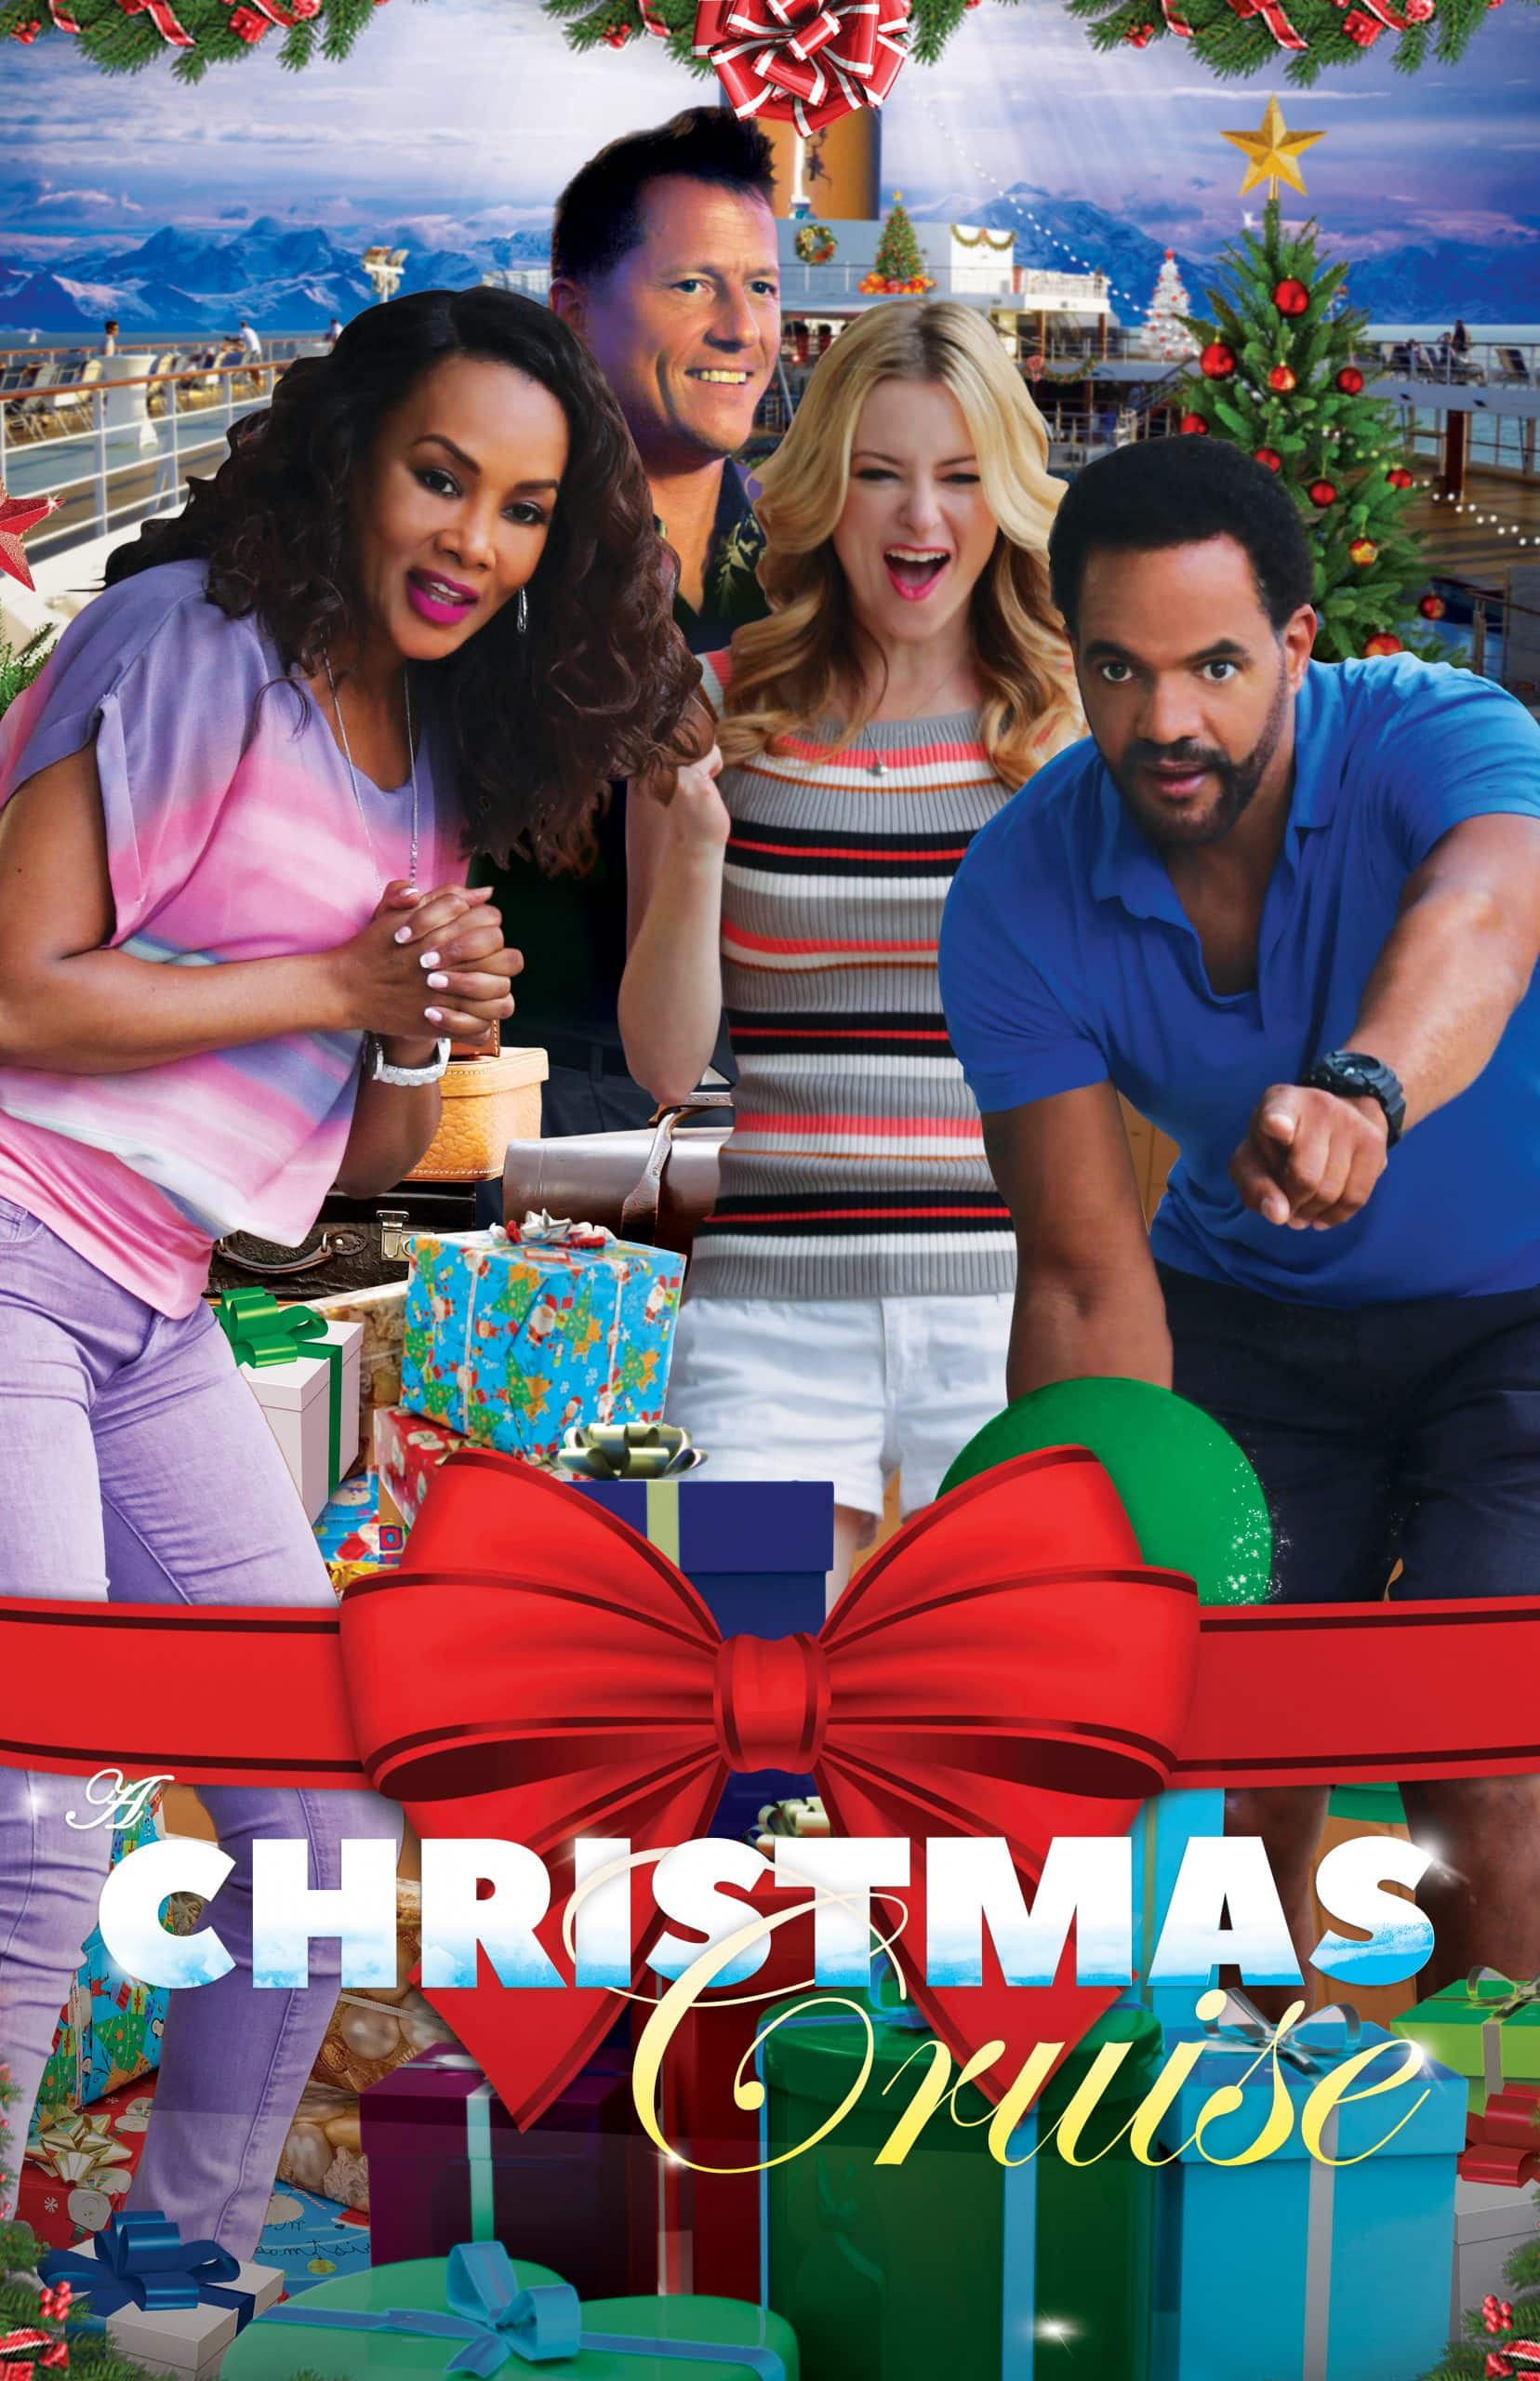 Christmas Cruise_Poster streamingsdienst